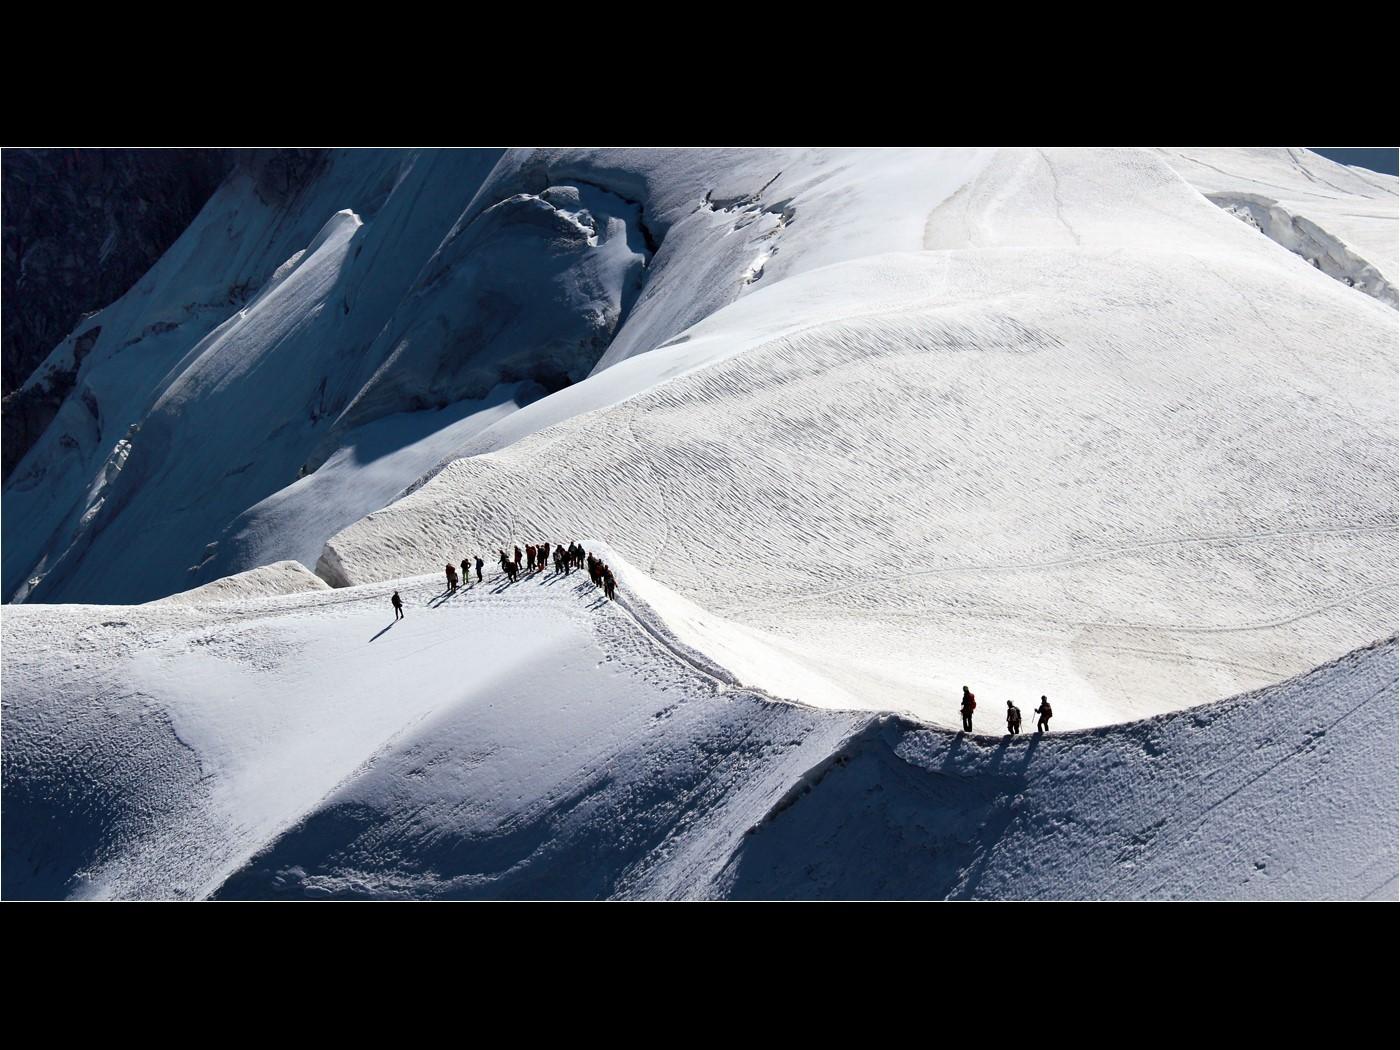 Alpinists making tracks above Chamonix